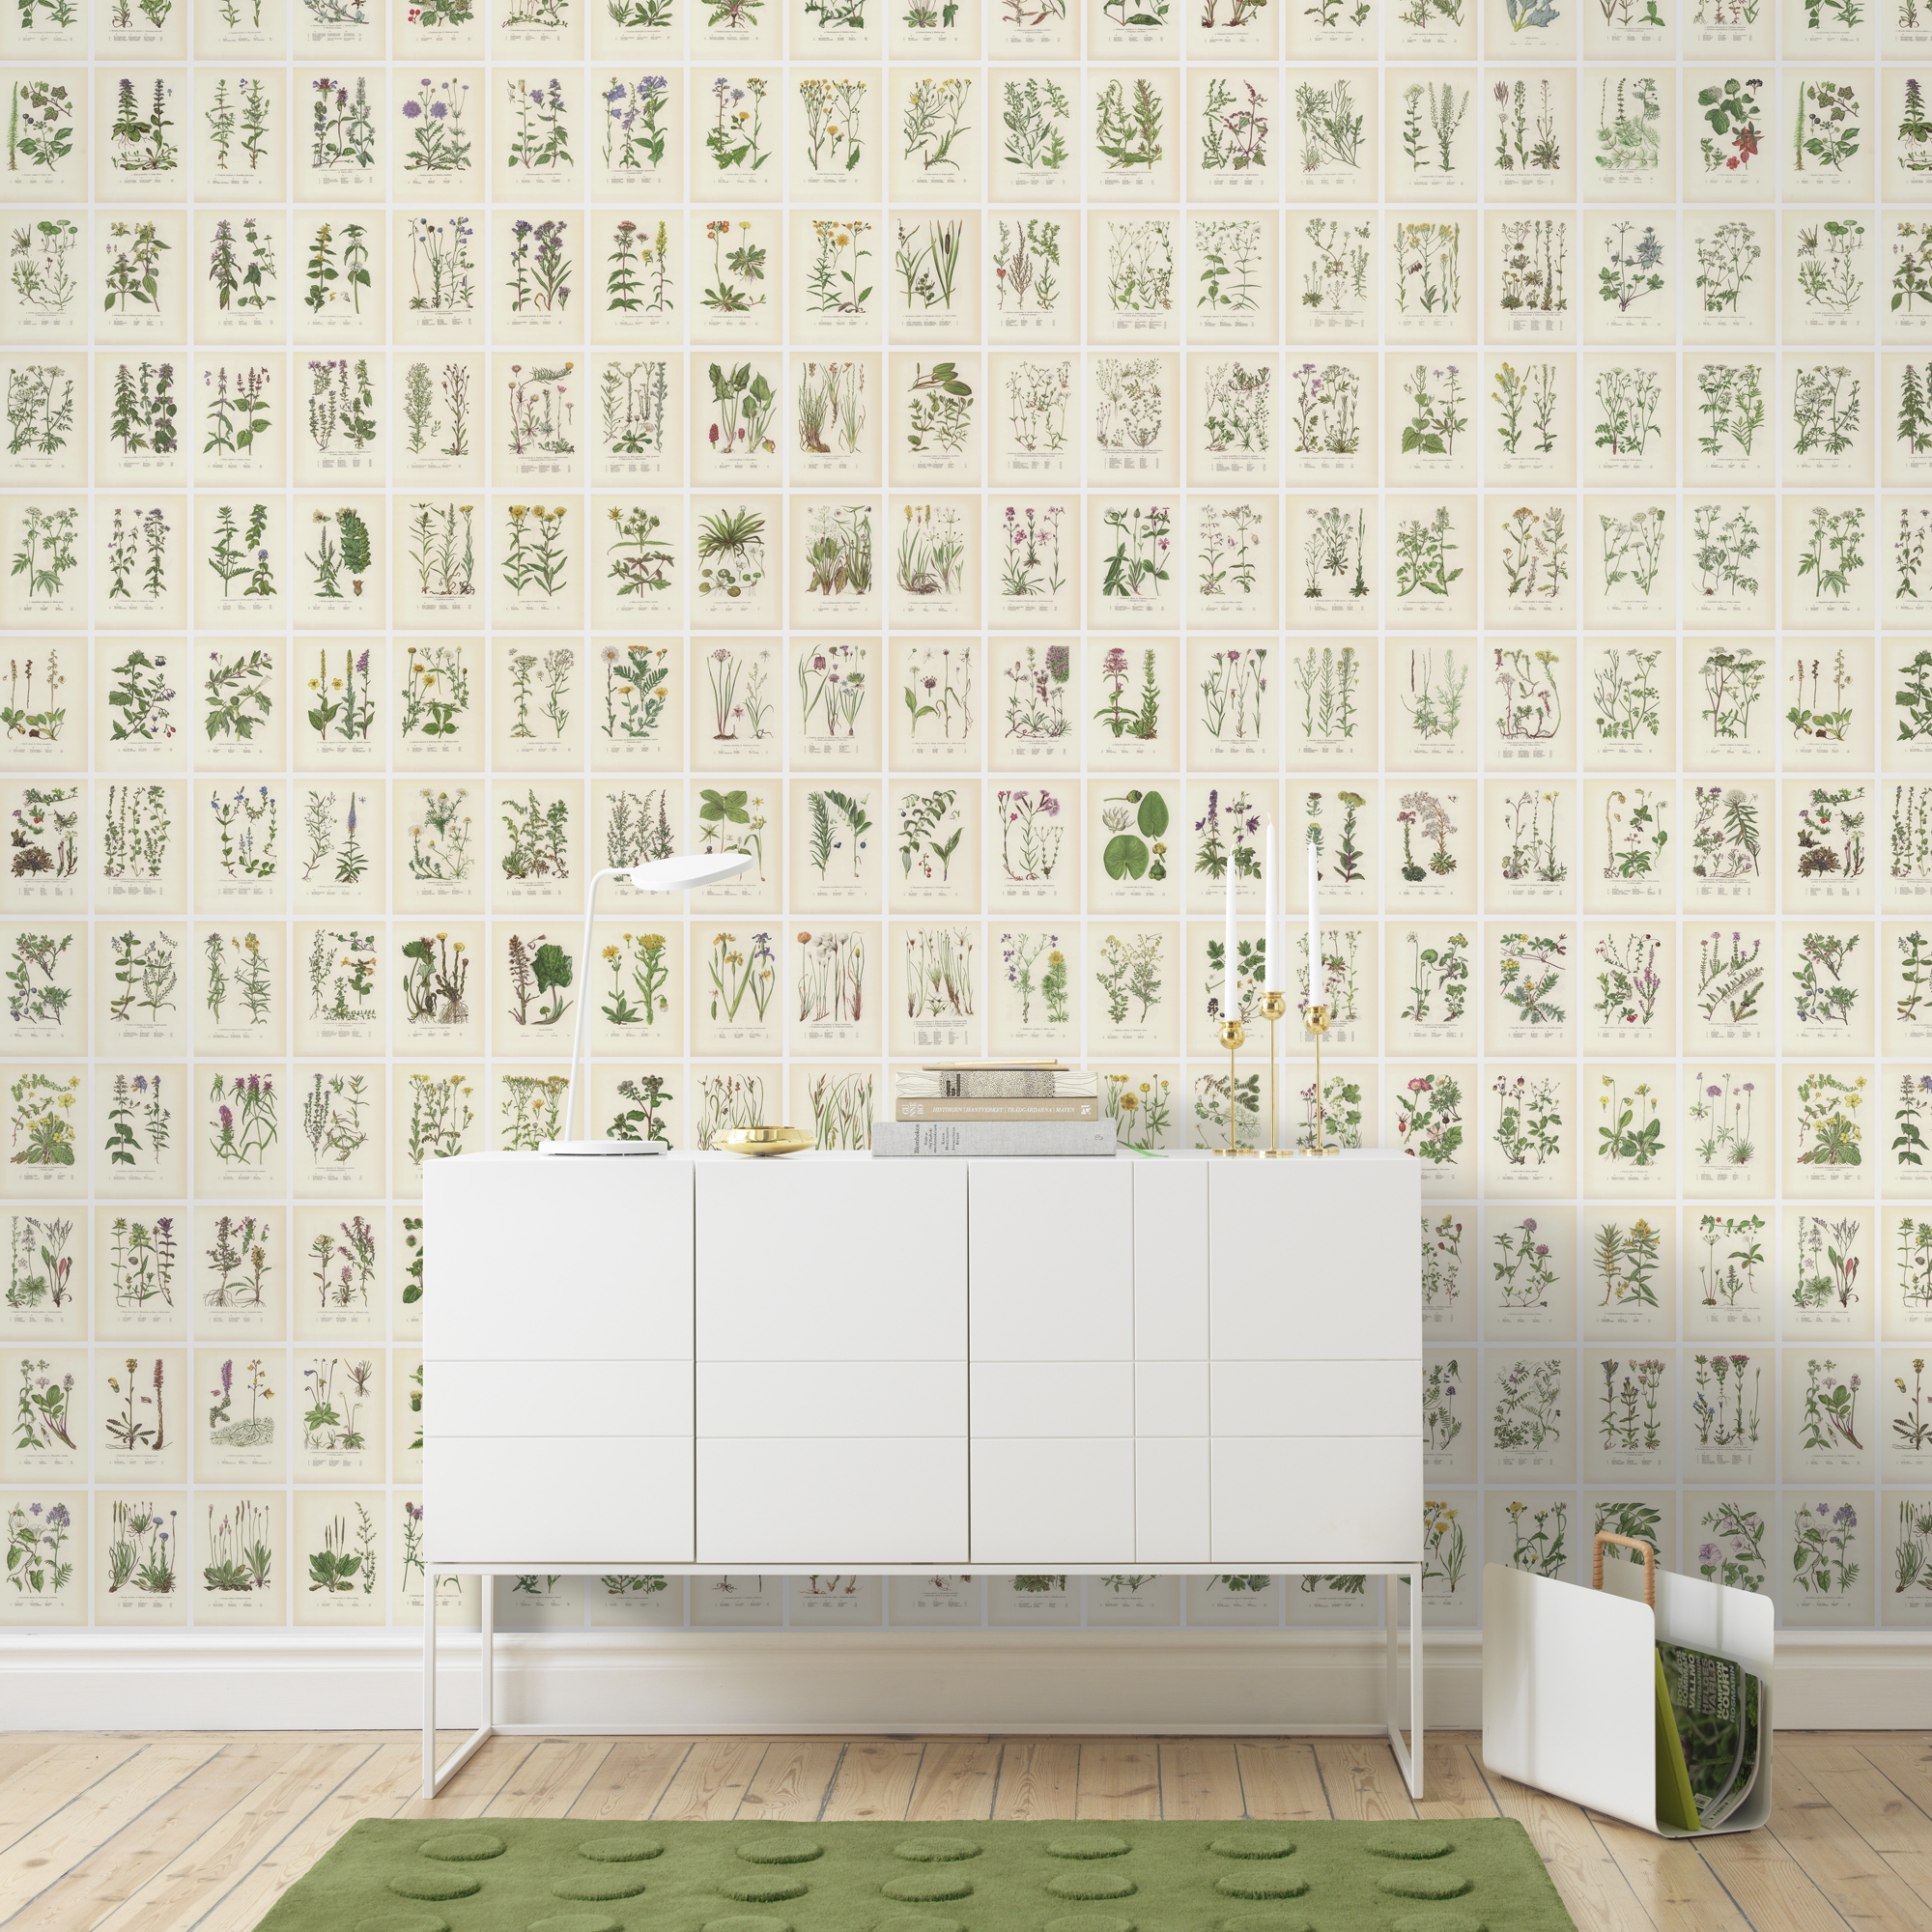 Botanica by Sandberg Wallpaper Direct 2000x2000